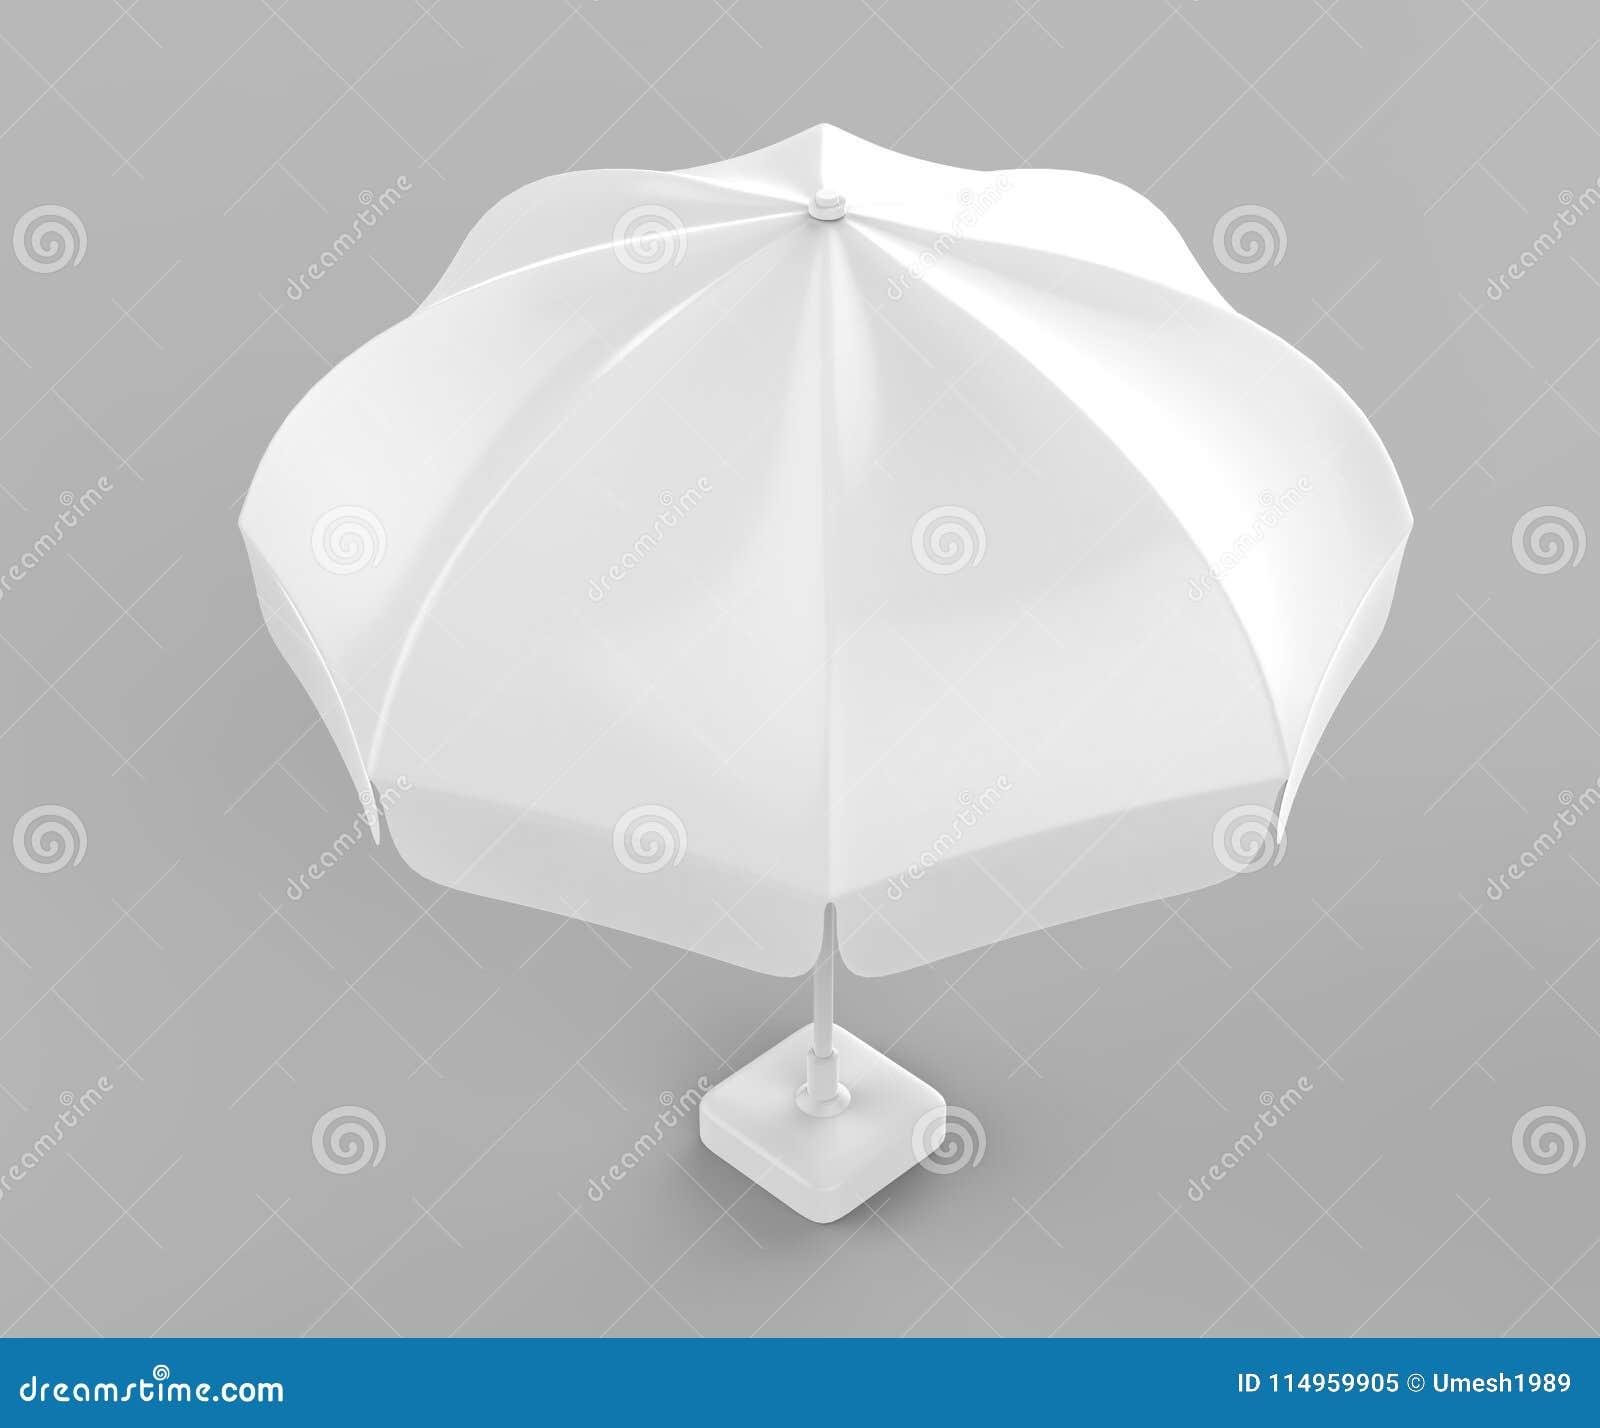 Promotional Aluminum Sun Pop Up Parasol Umbrella For Advertising 3d